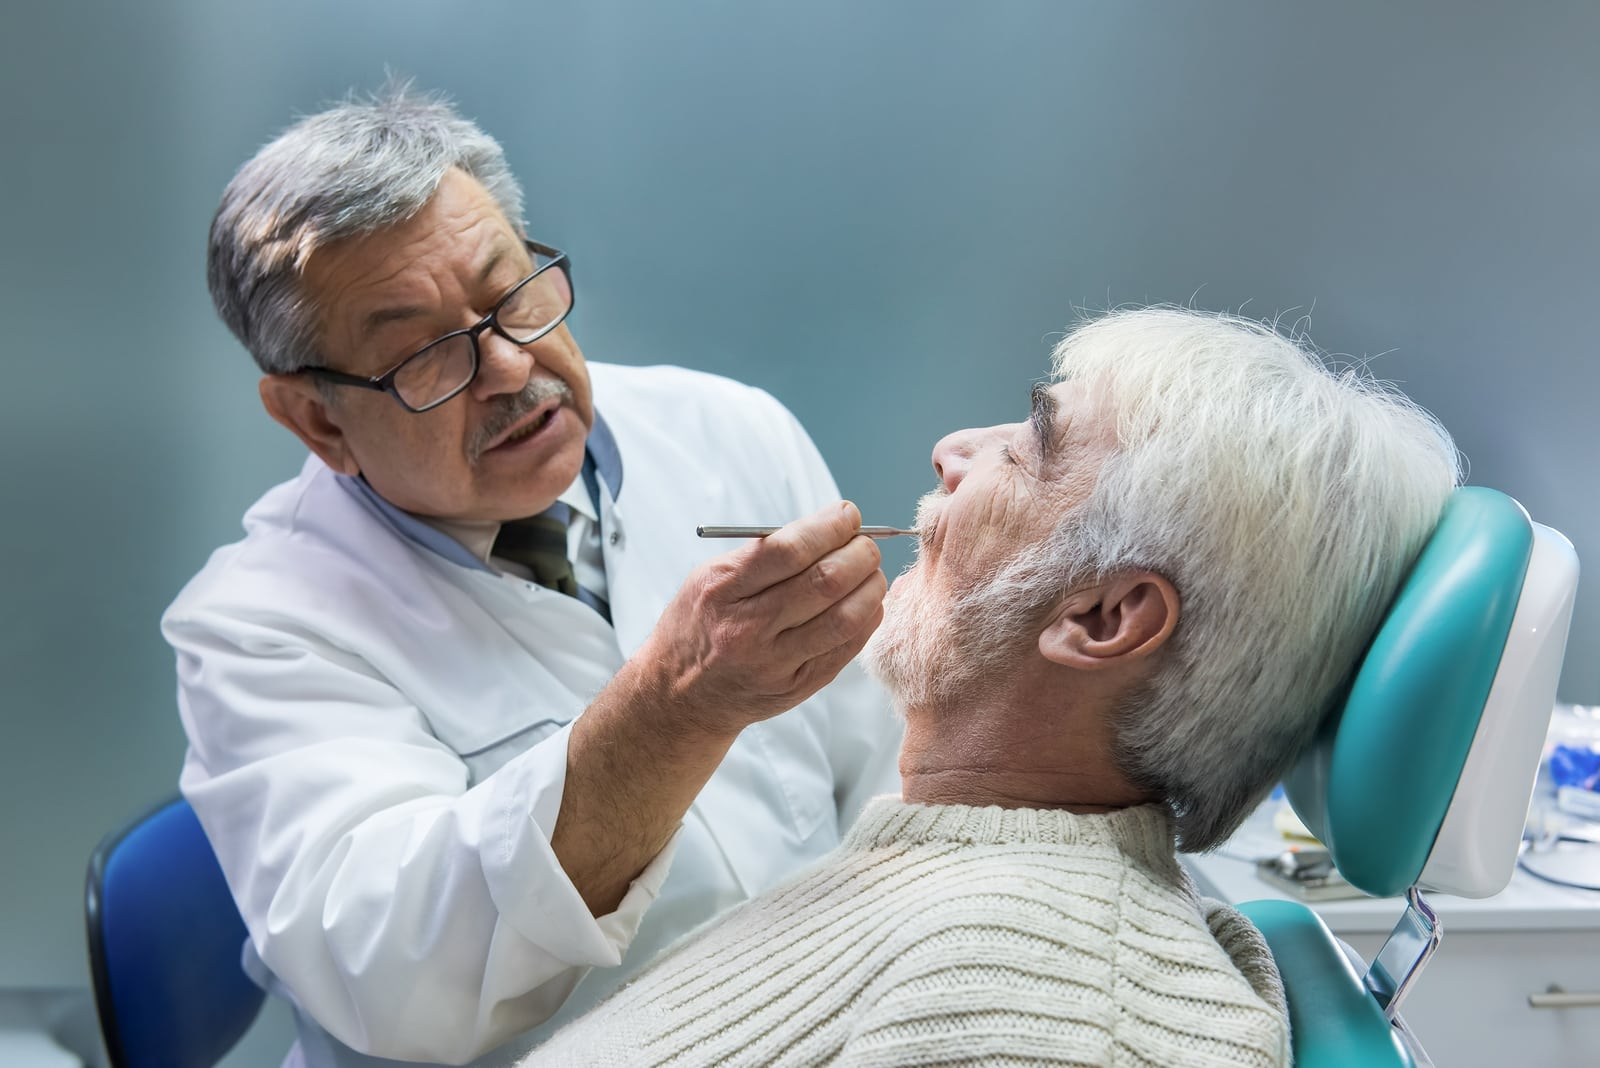 elderly senior citizen at dentist